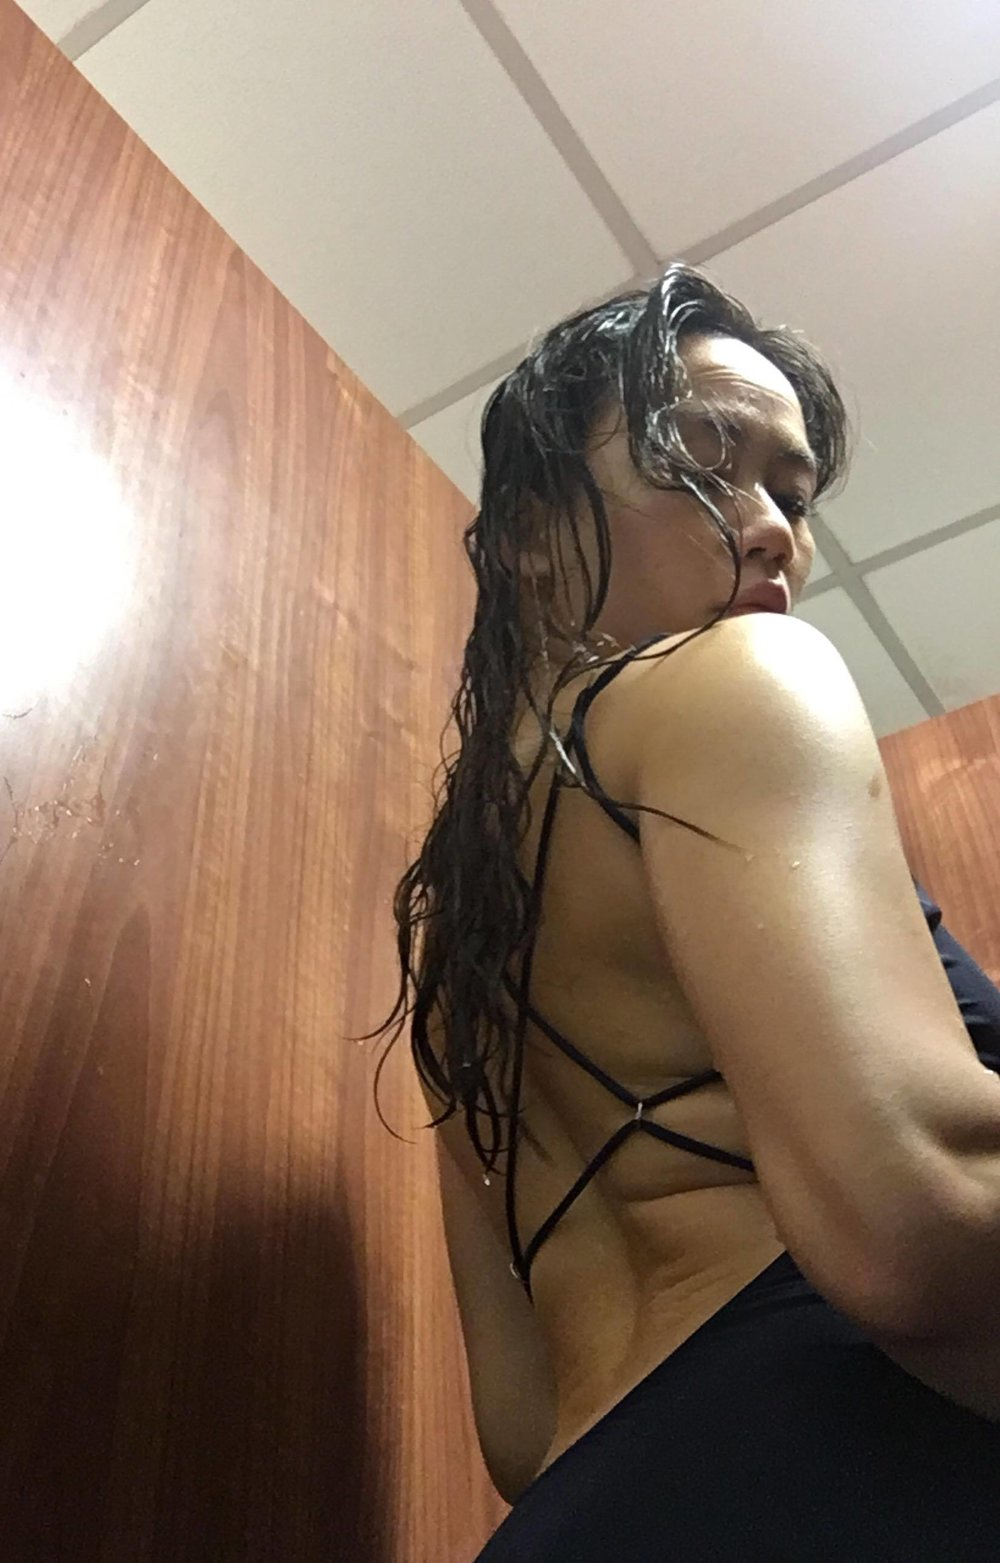 Halla swimsuit by Acne Studios